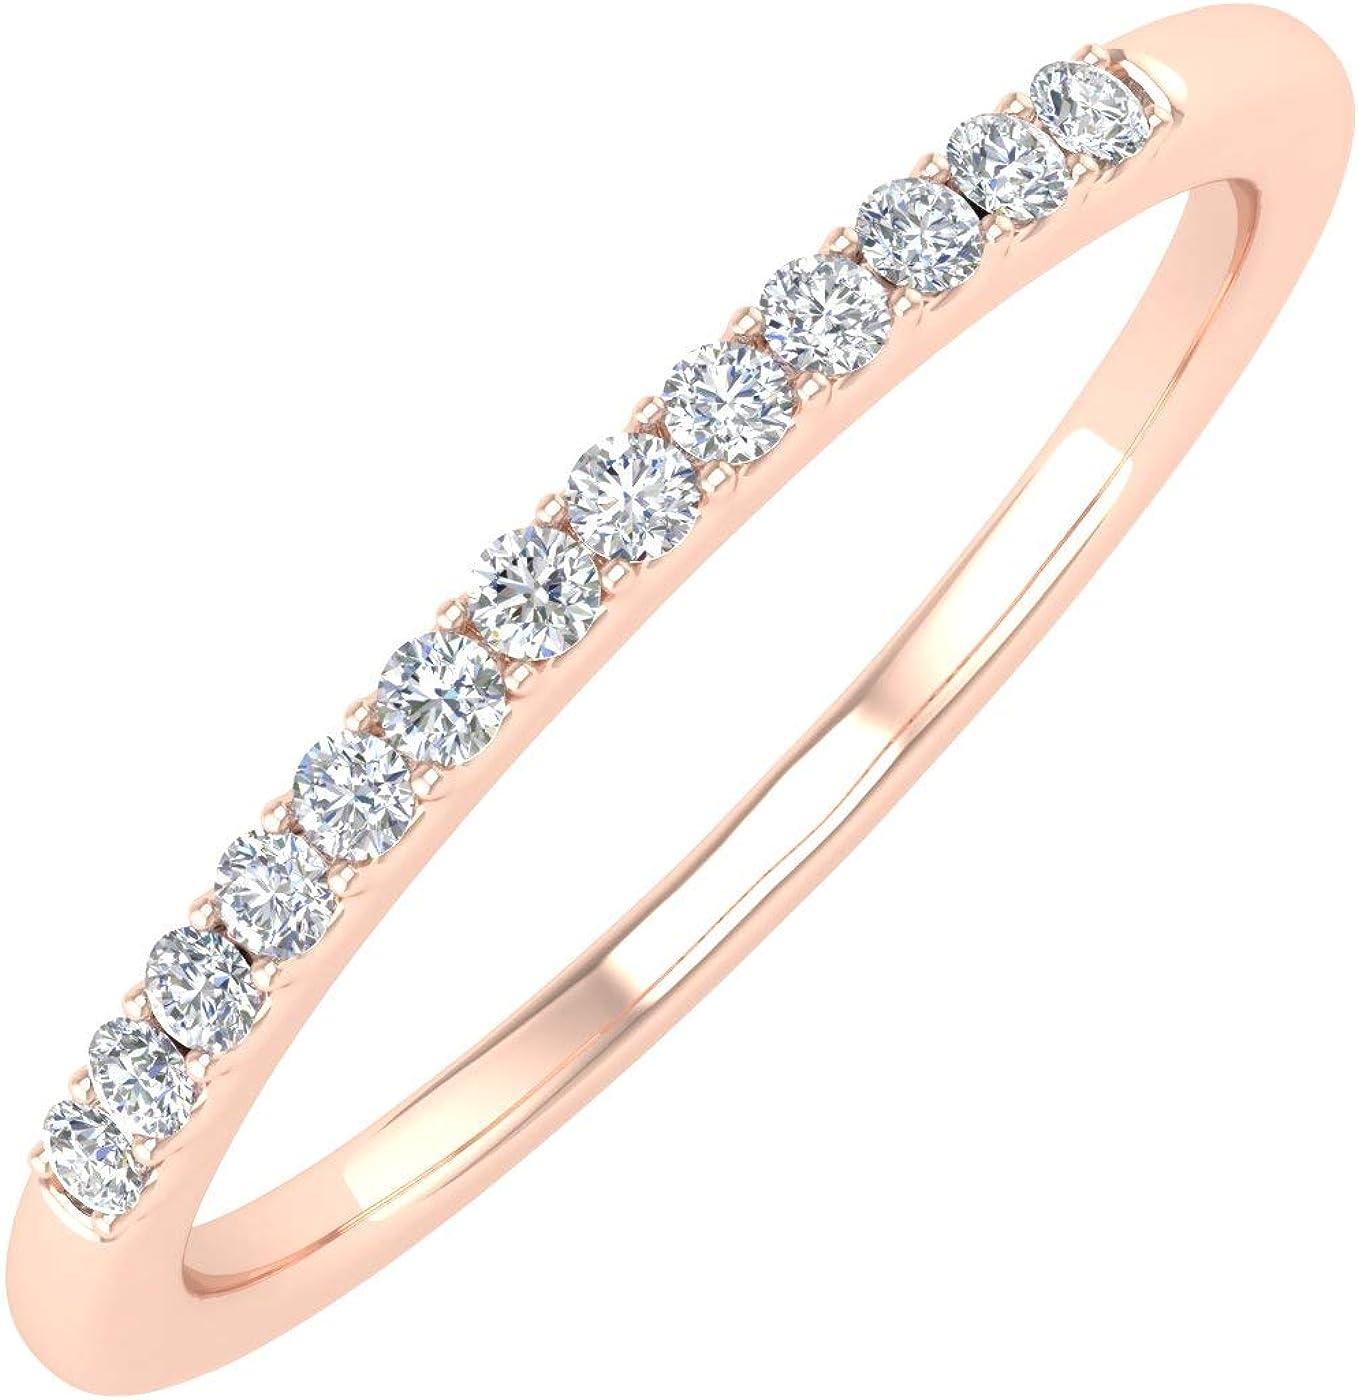 1/10 Carat Diamond Anniversary Ring Band in 10K Gold